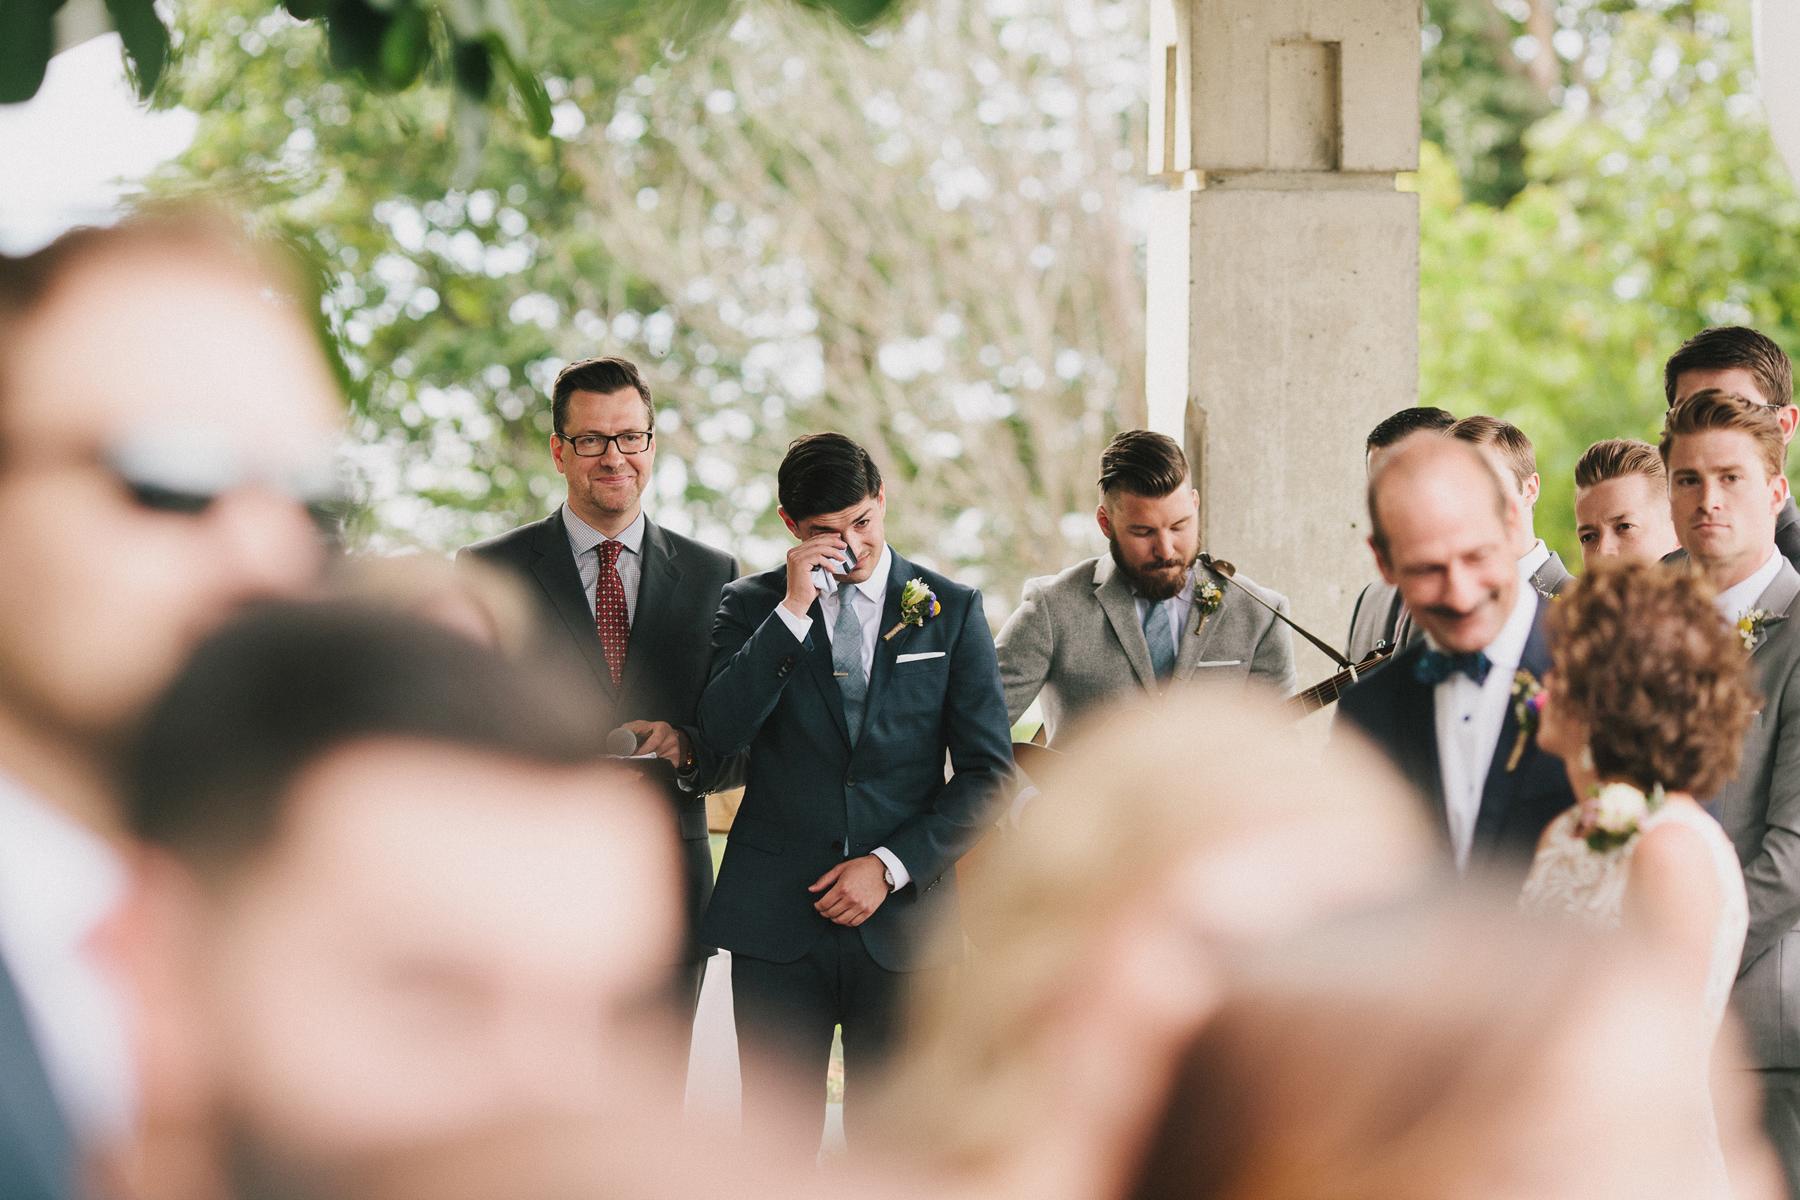 UBC-Botanical-Garden-Wedding-AD-034.jpg